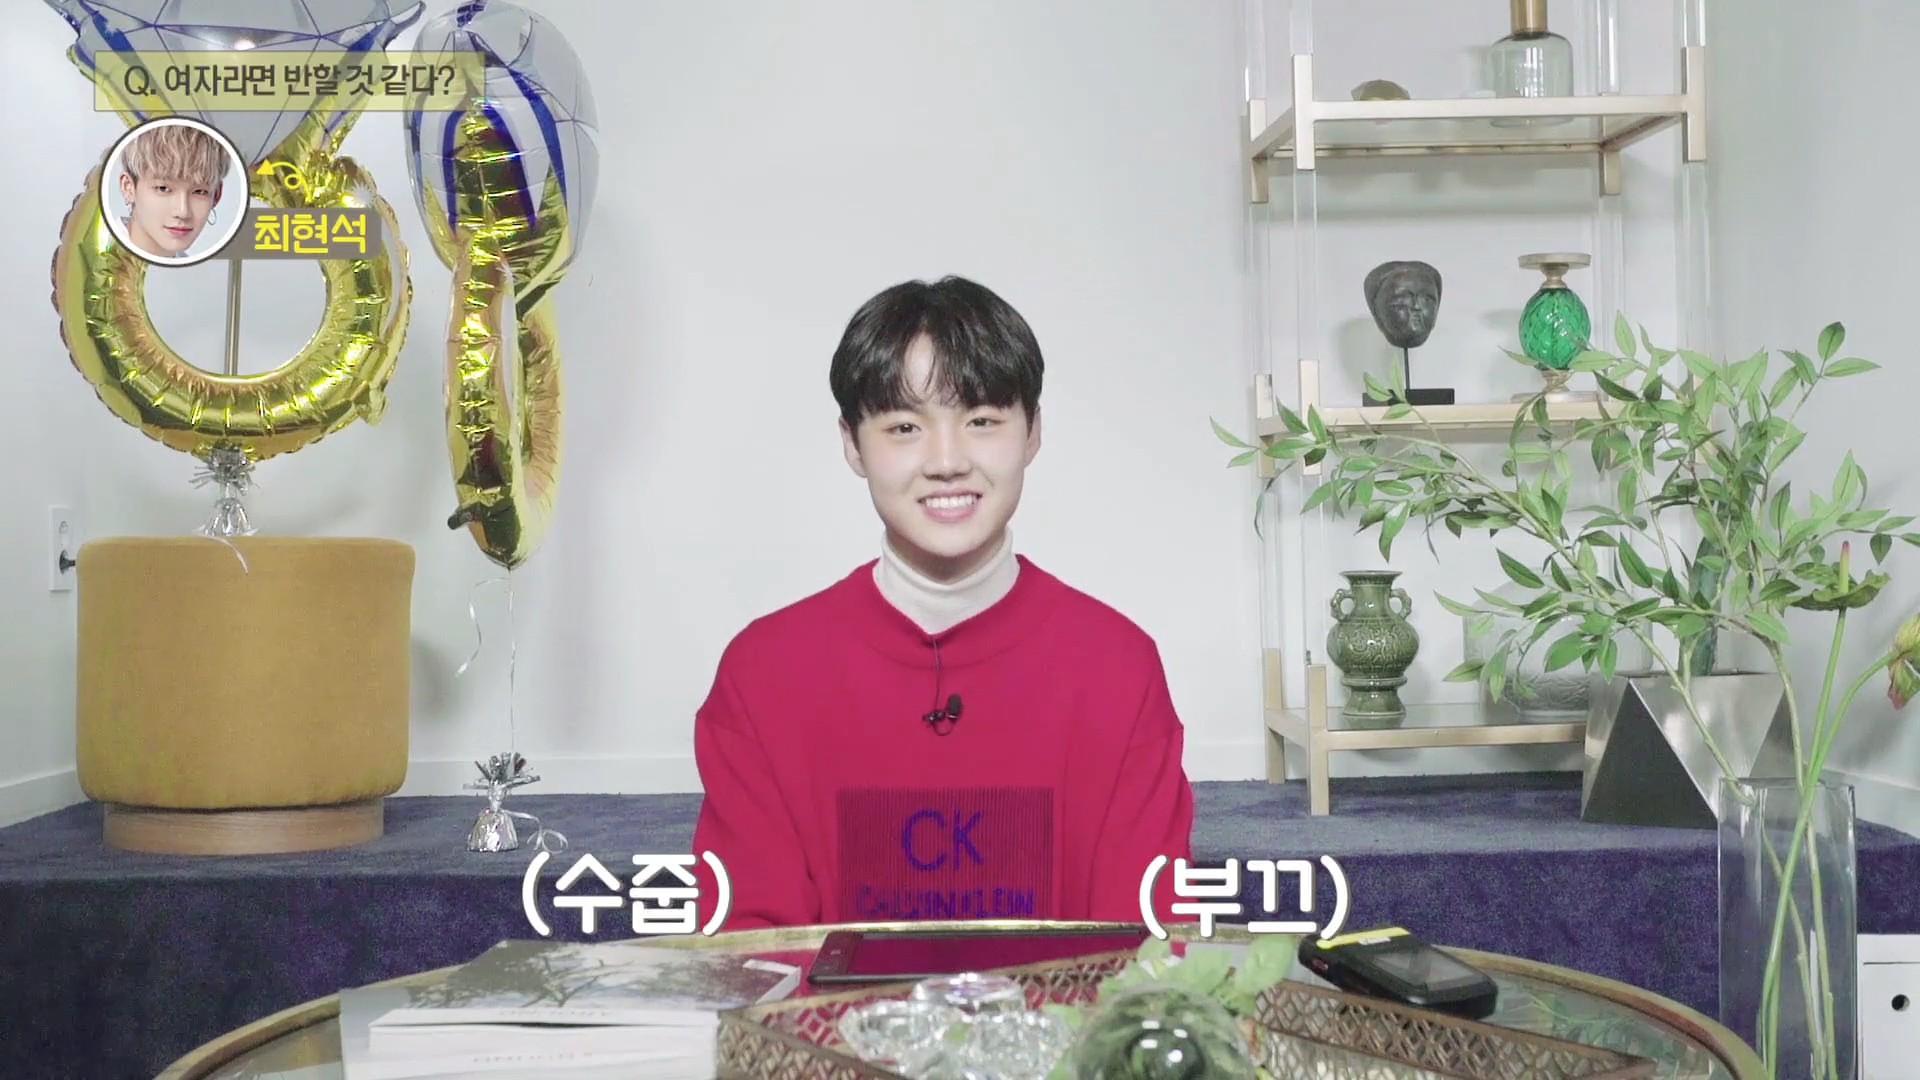 [SURVEY CAM] A#6 김도영 <KIM DOYOUNG> l YG보석함